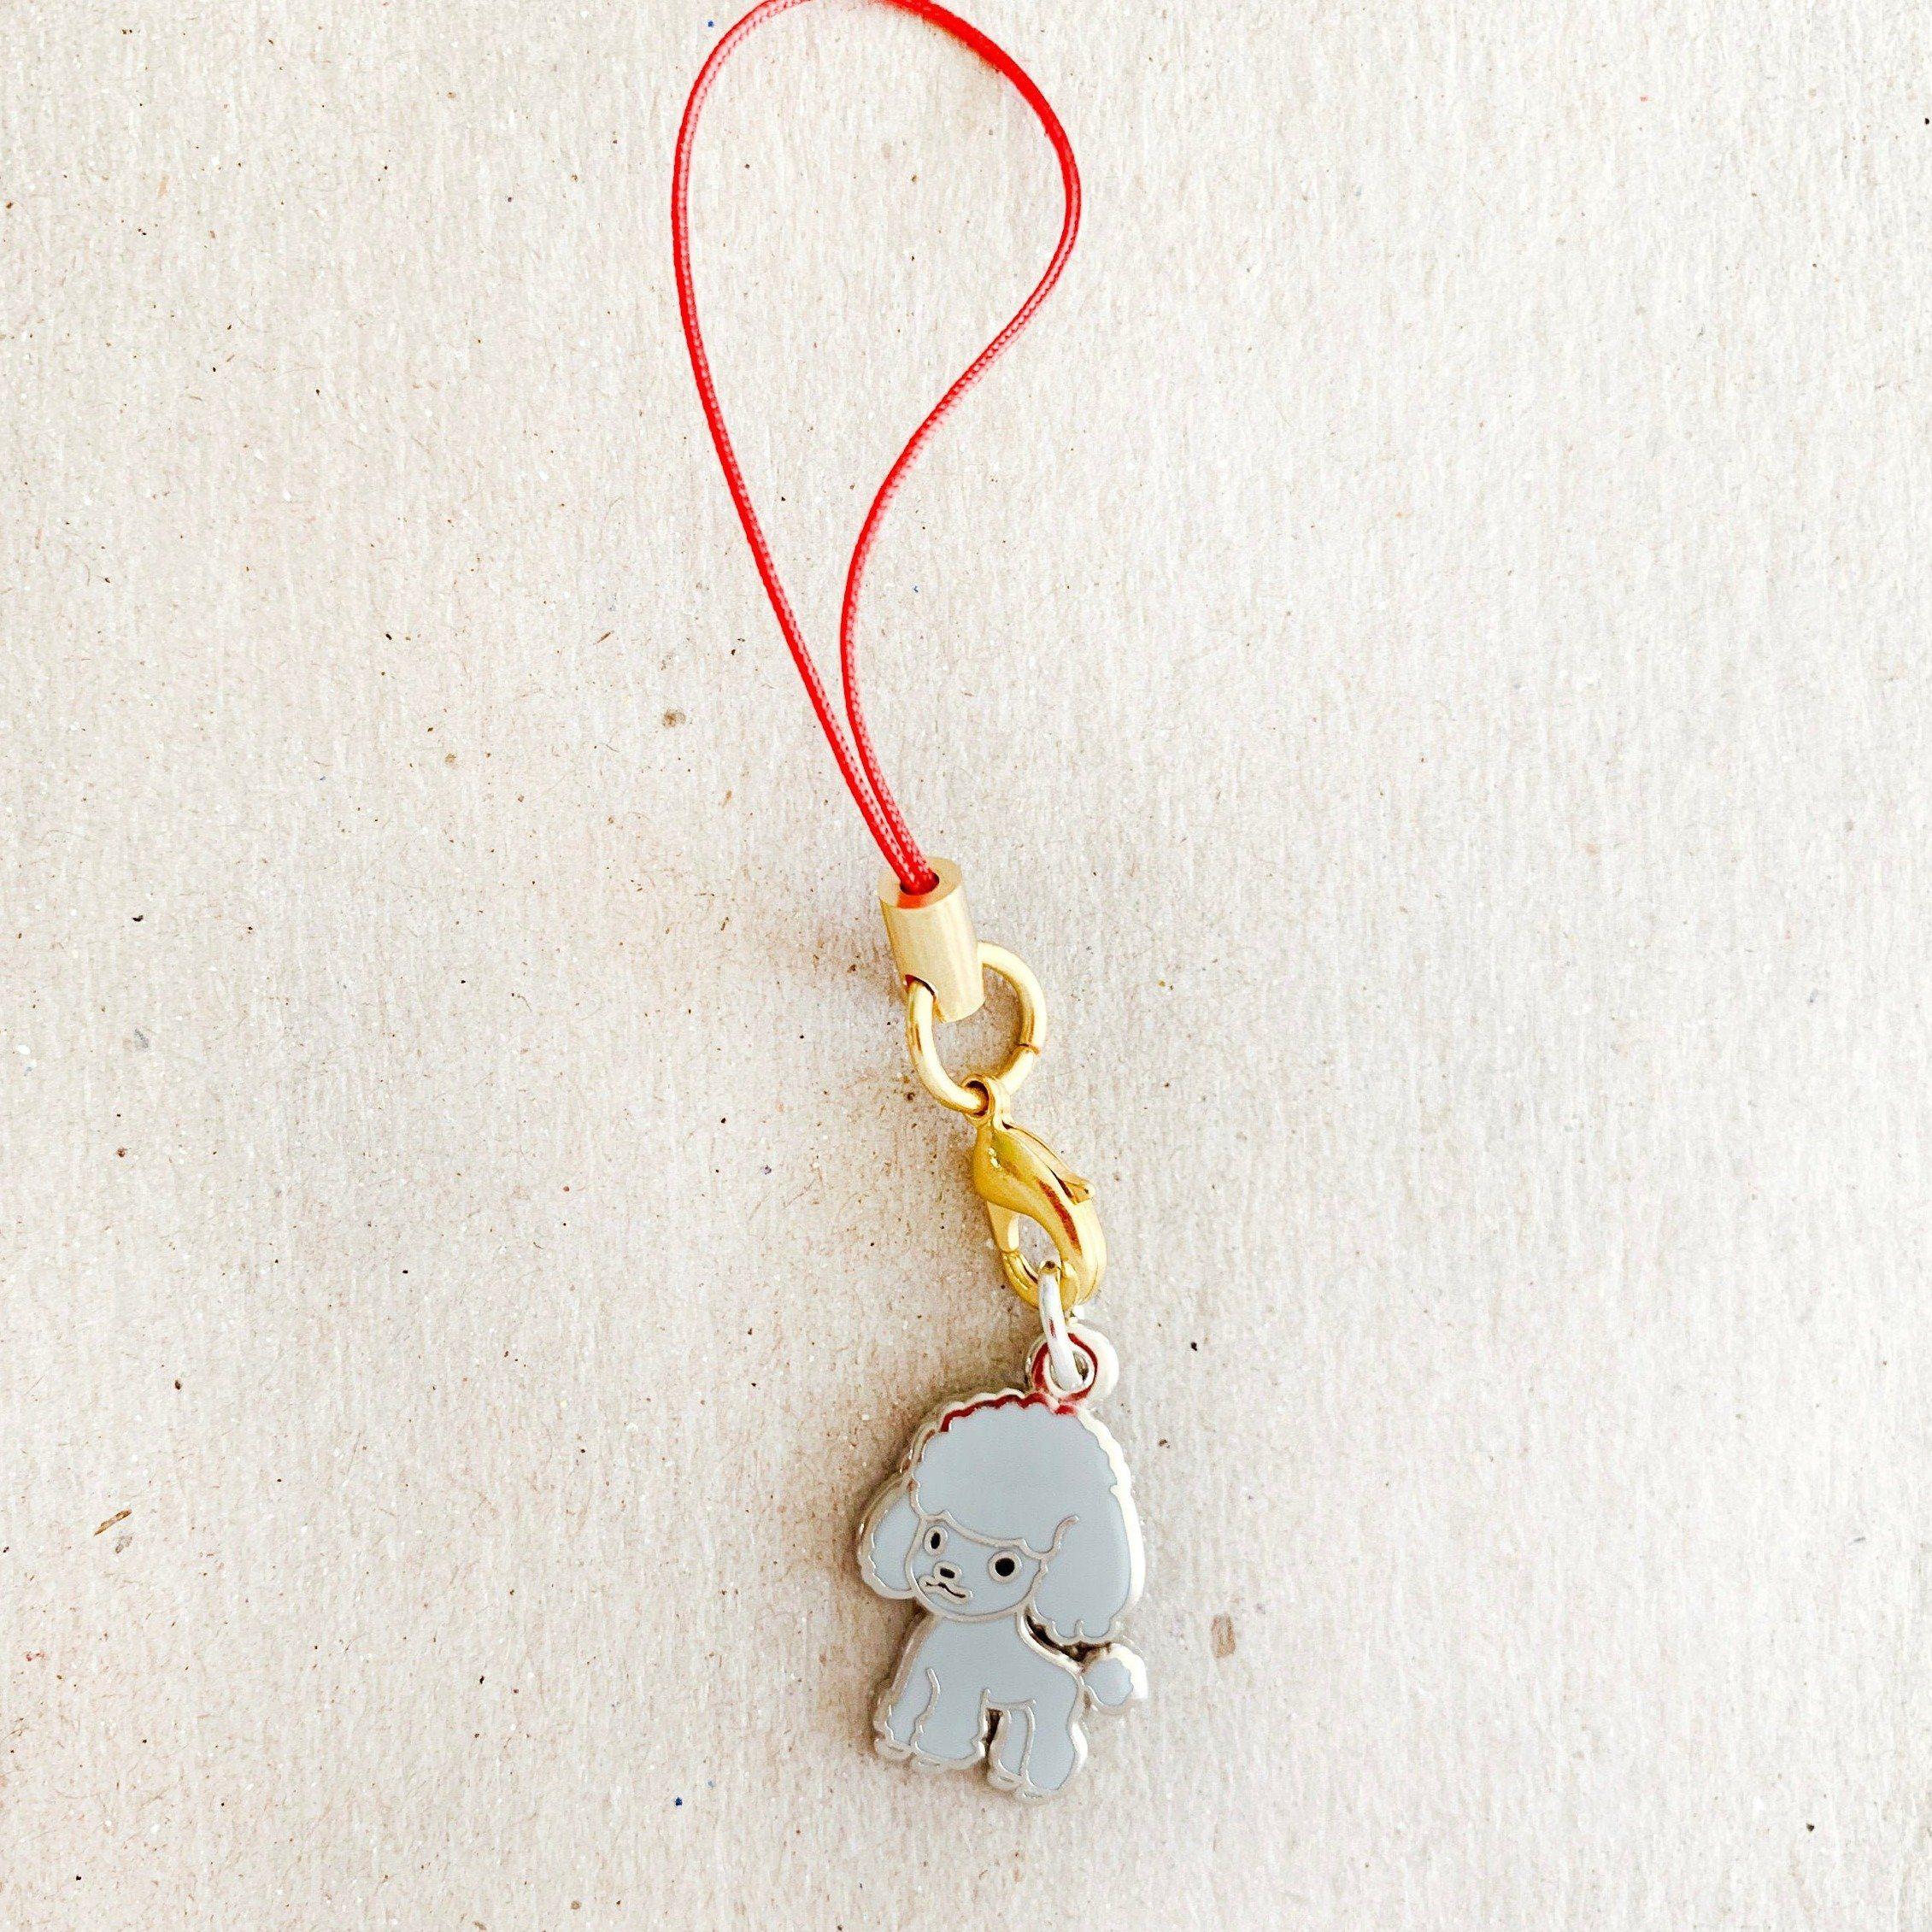 Enamel Charm - Standard Poodle Keychain (Gray)